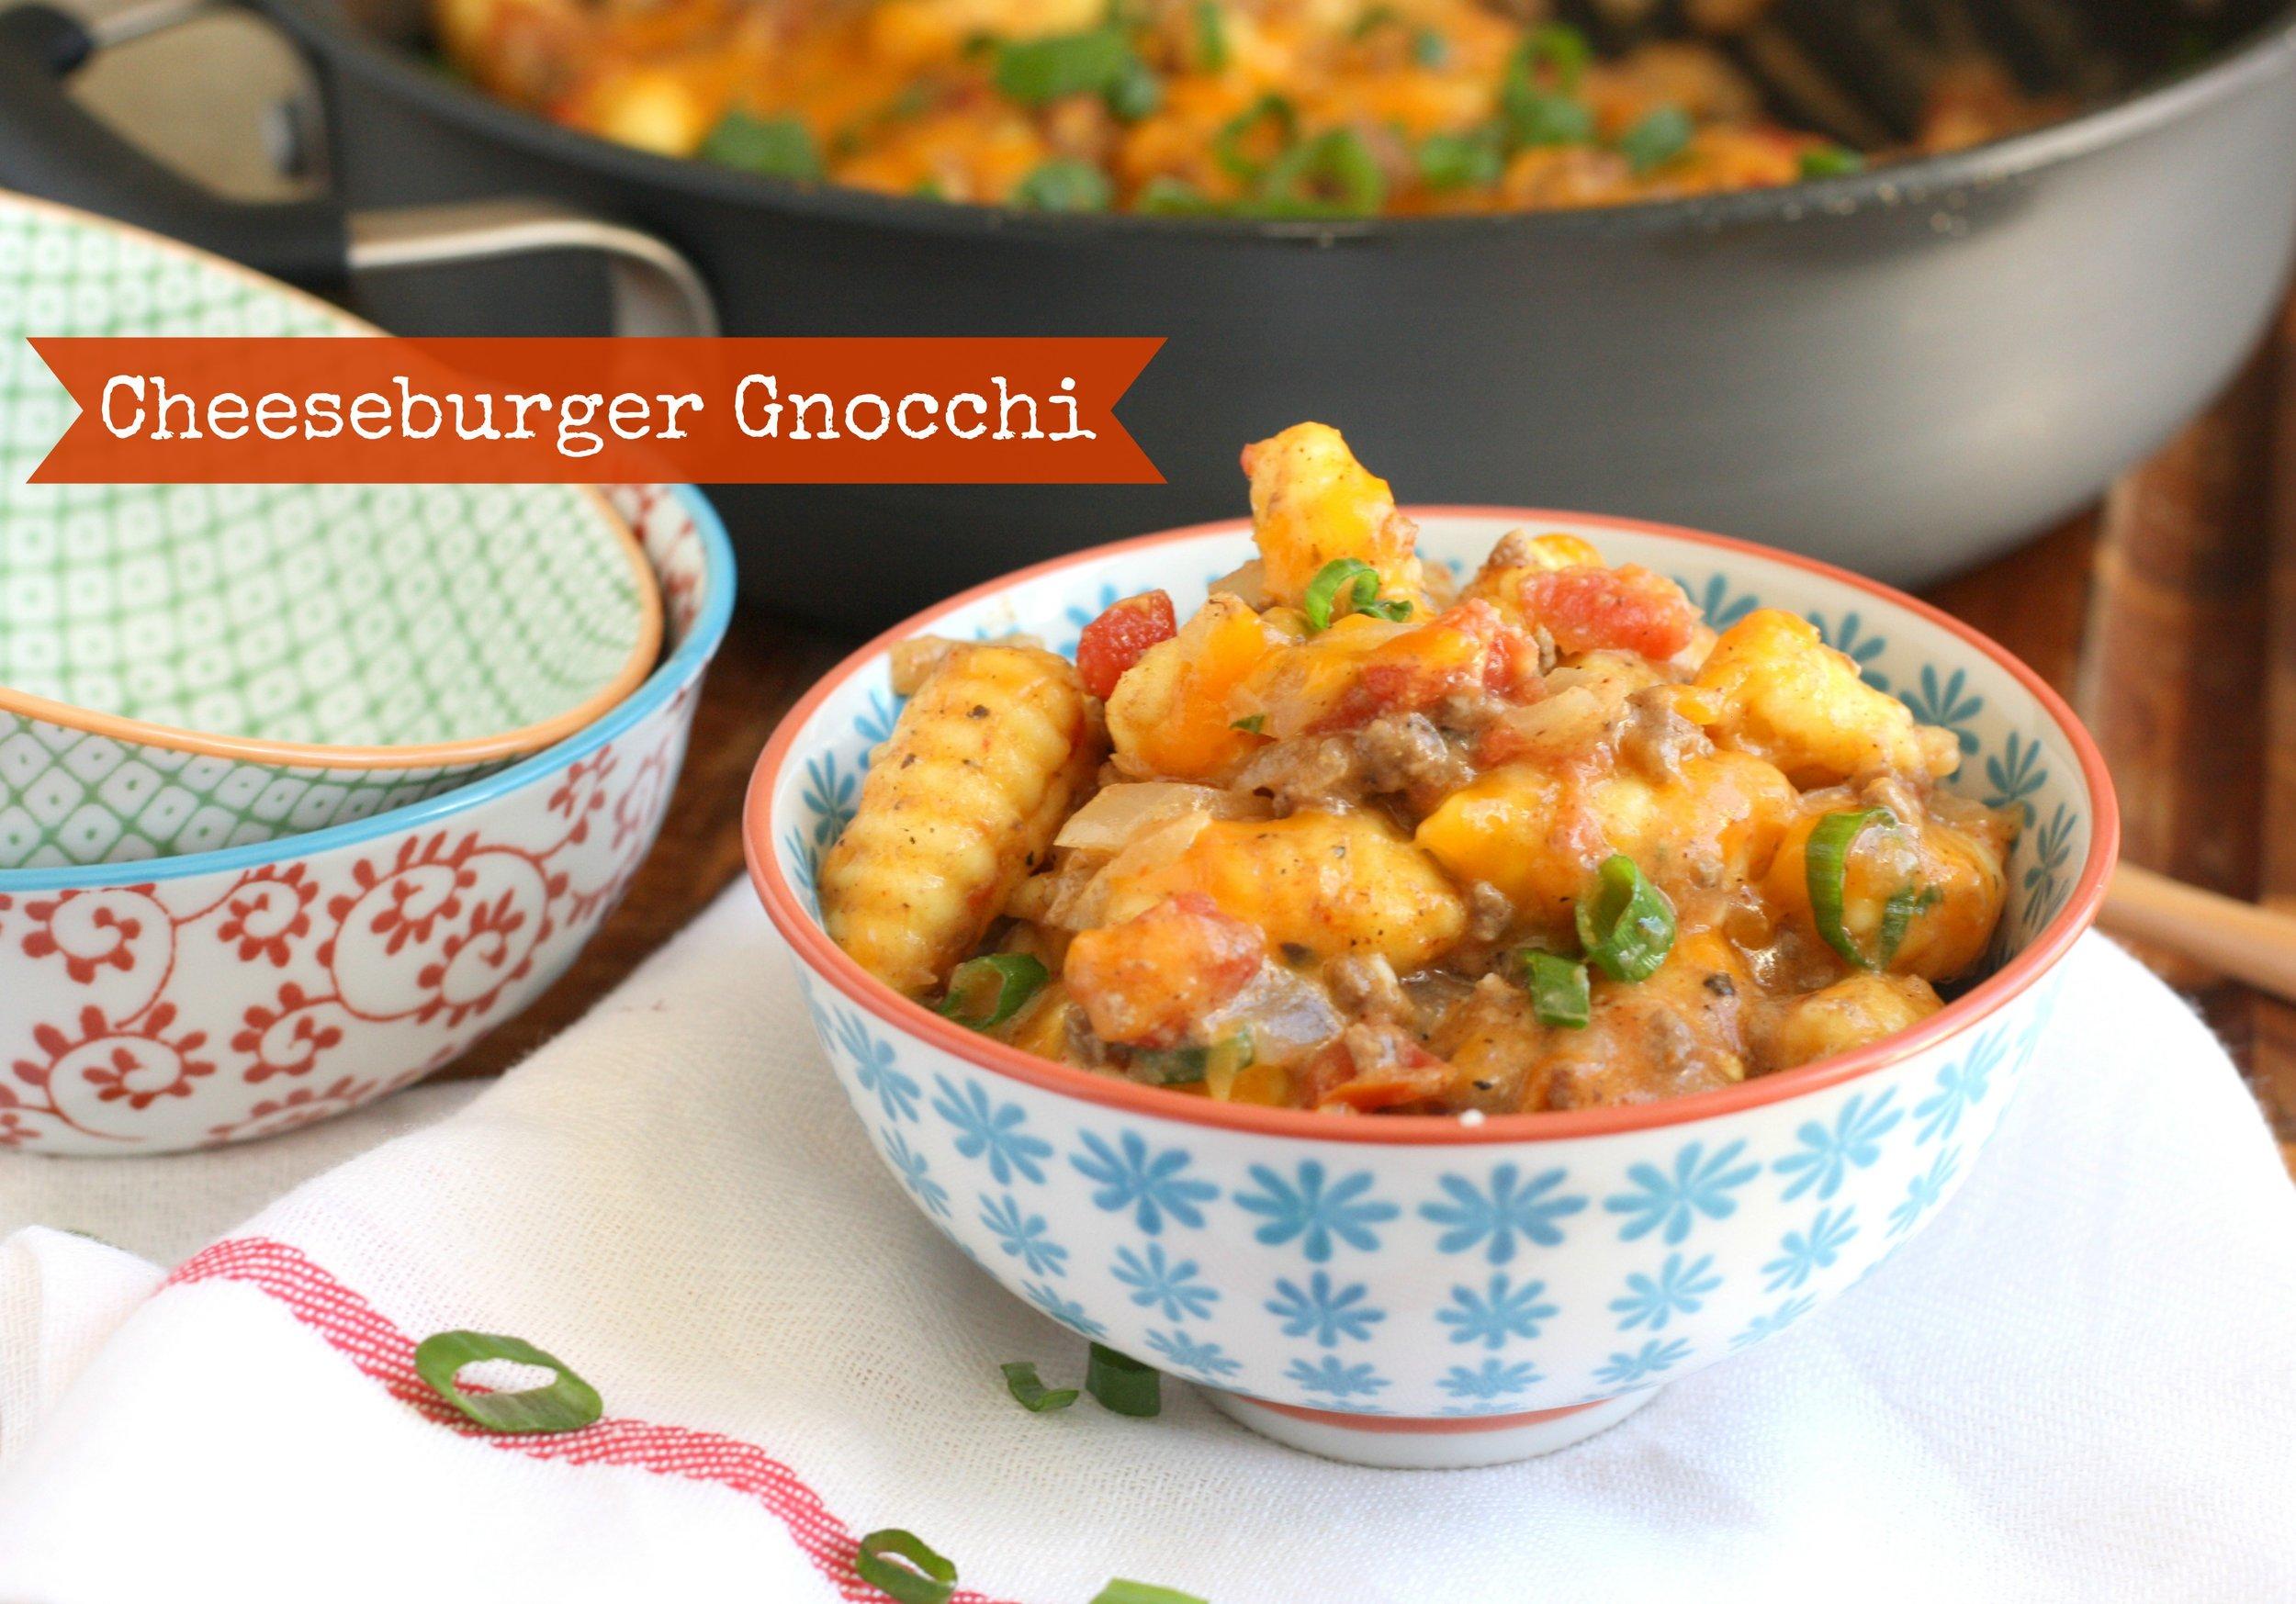 Cheeseburger Gnocchi1-text2.jpg